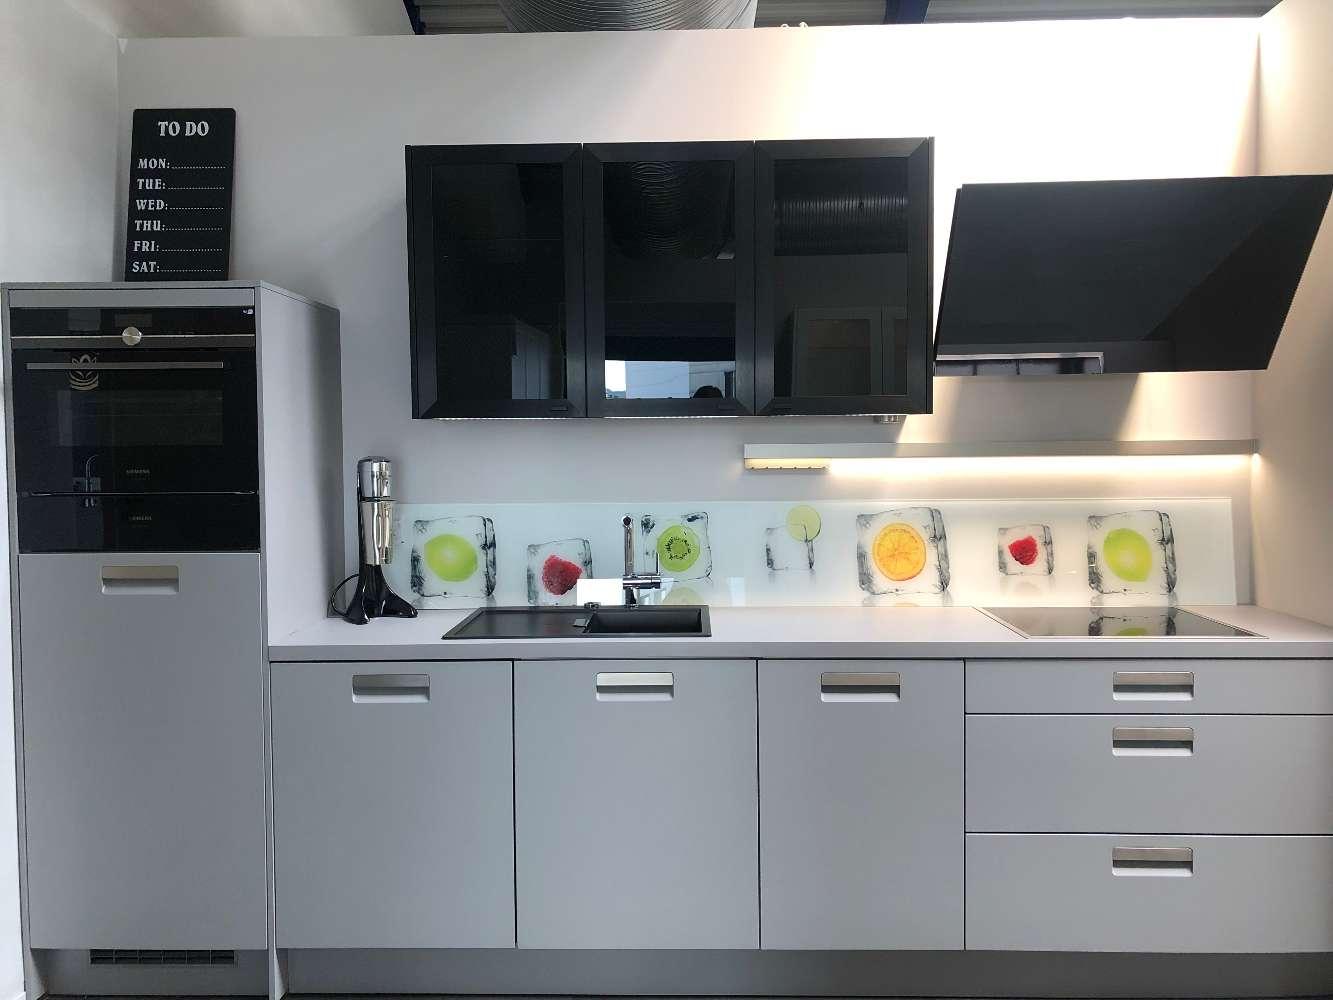 Full Size of Hcker Ausstellungskche Planungswelten Müllsystem Küche Wohnzimmer Häcker Müllsystem